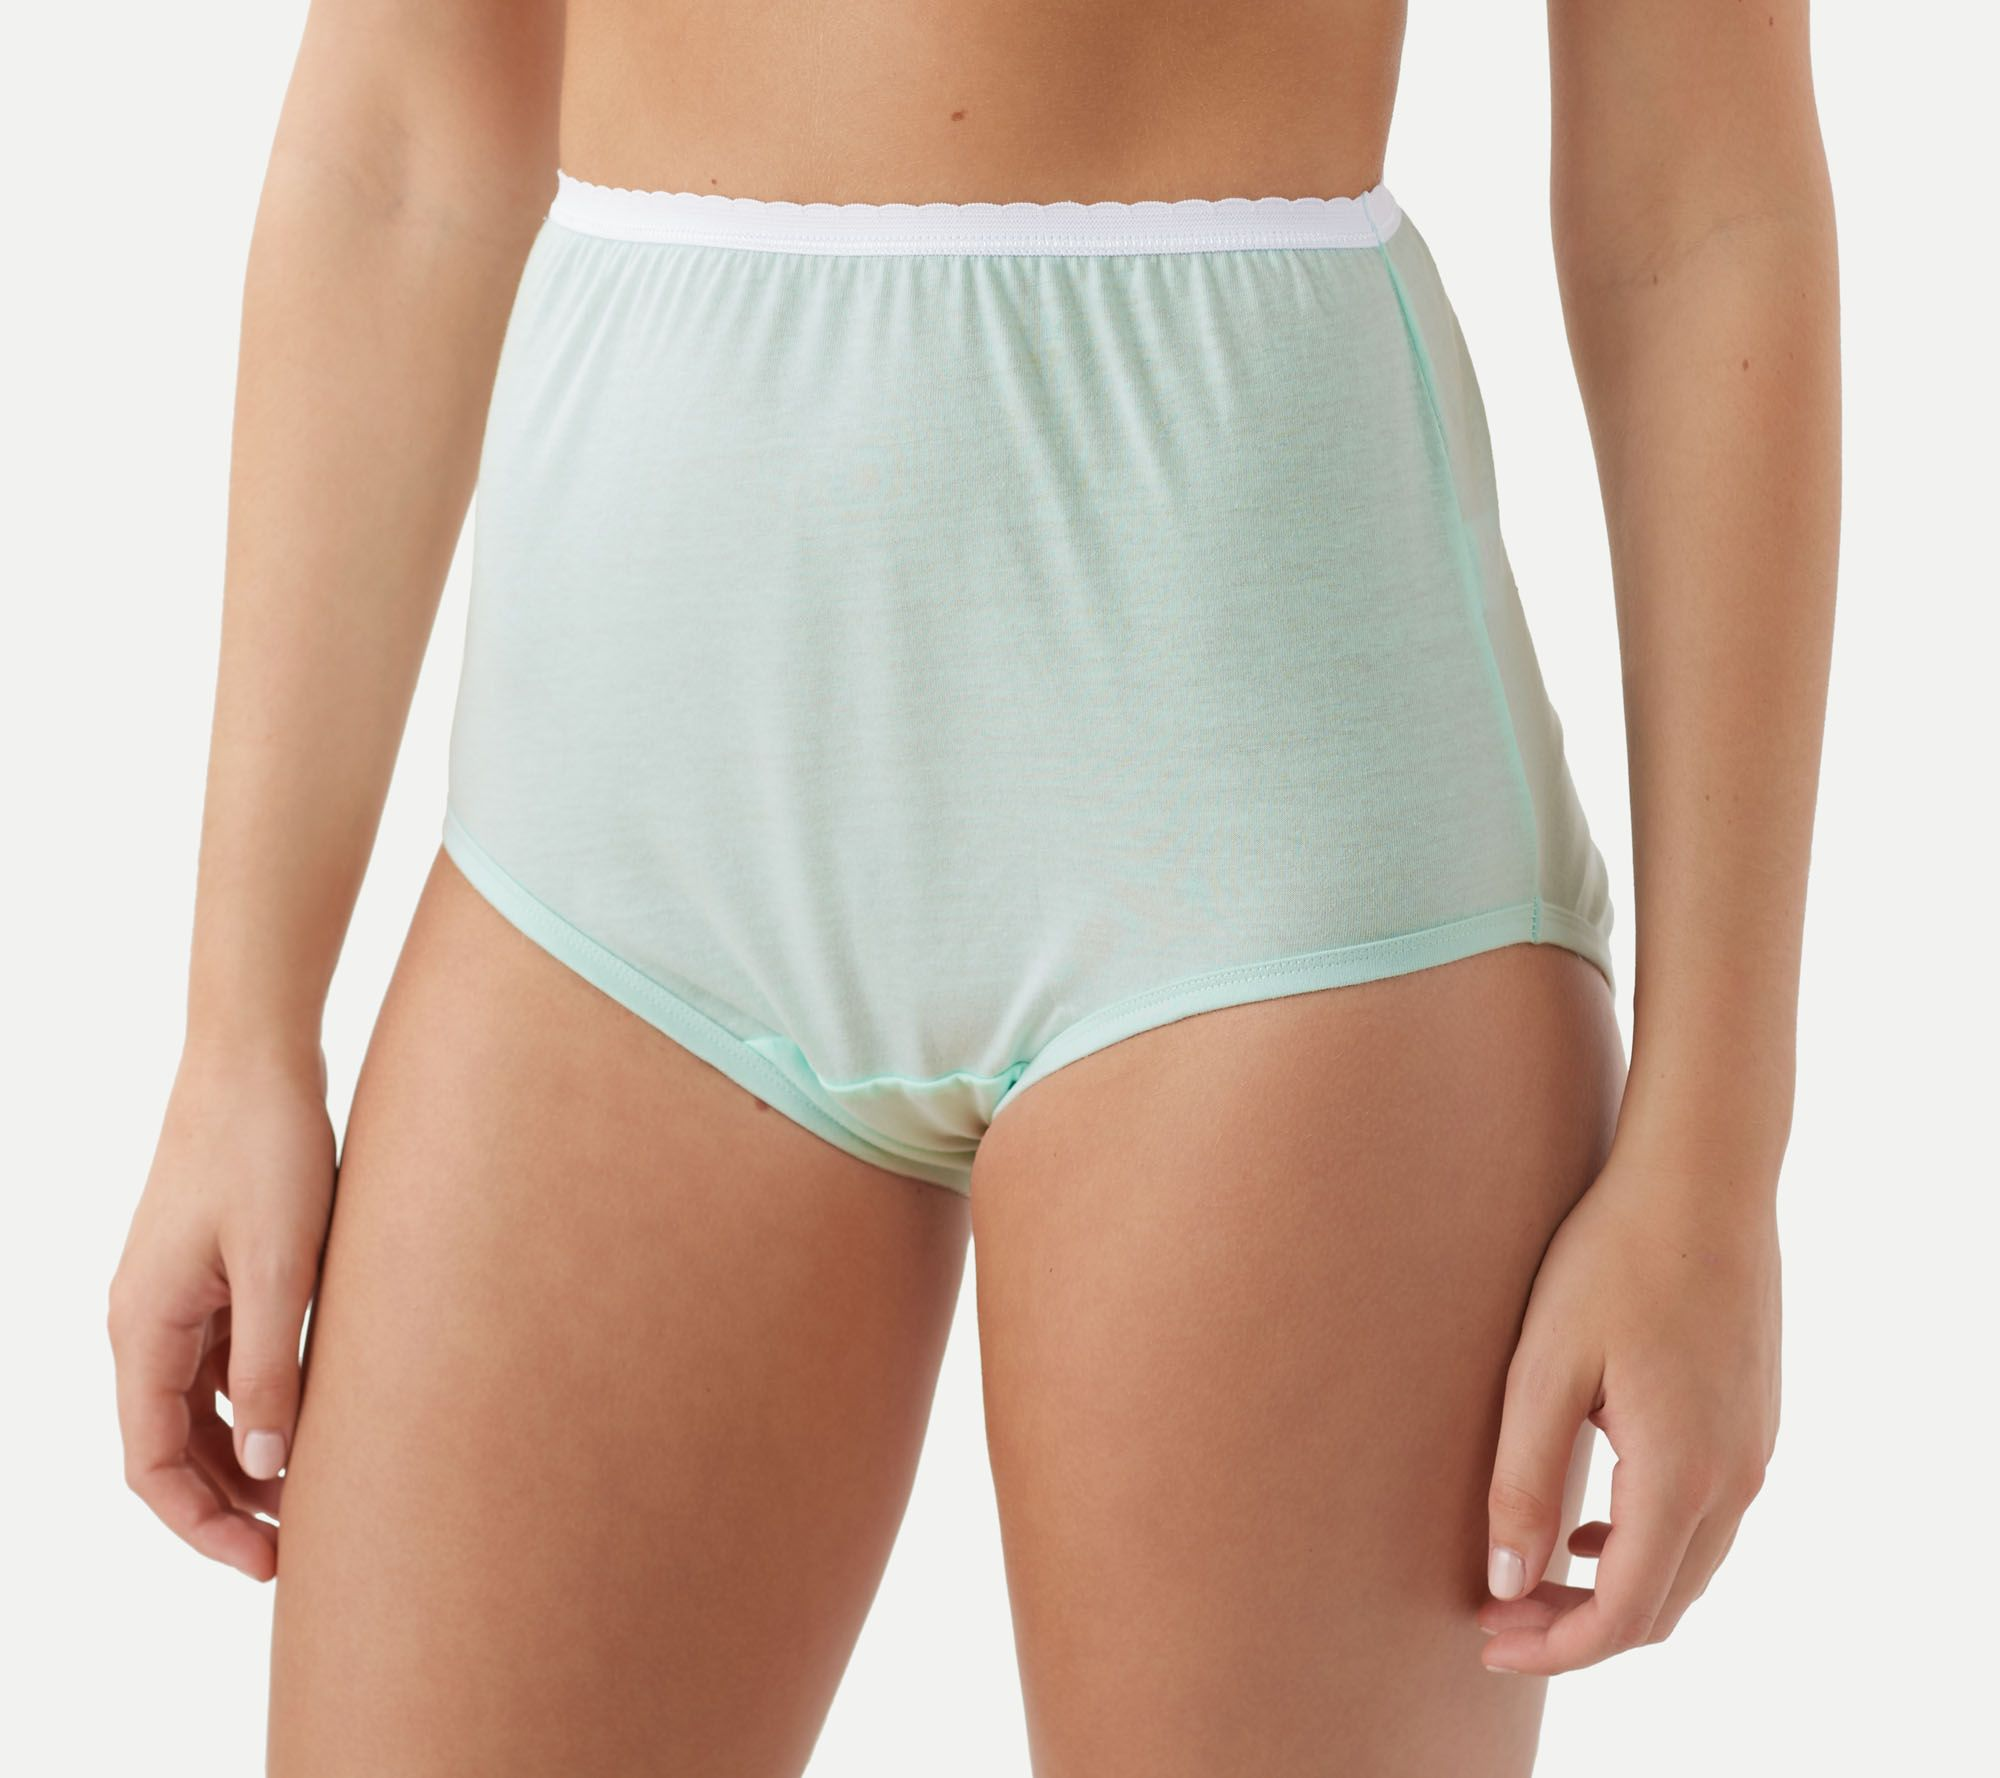 Breezies Set 6 Cotton Brief Panties UltimAir Basic 9 NEW A22766